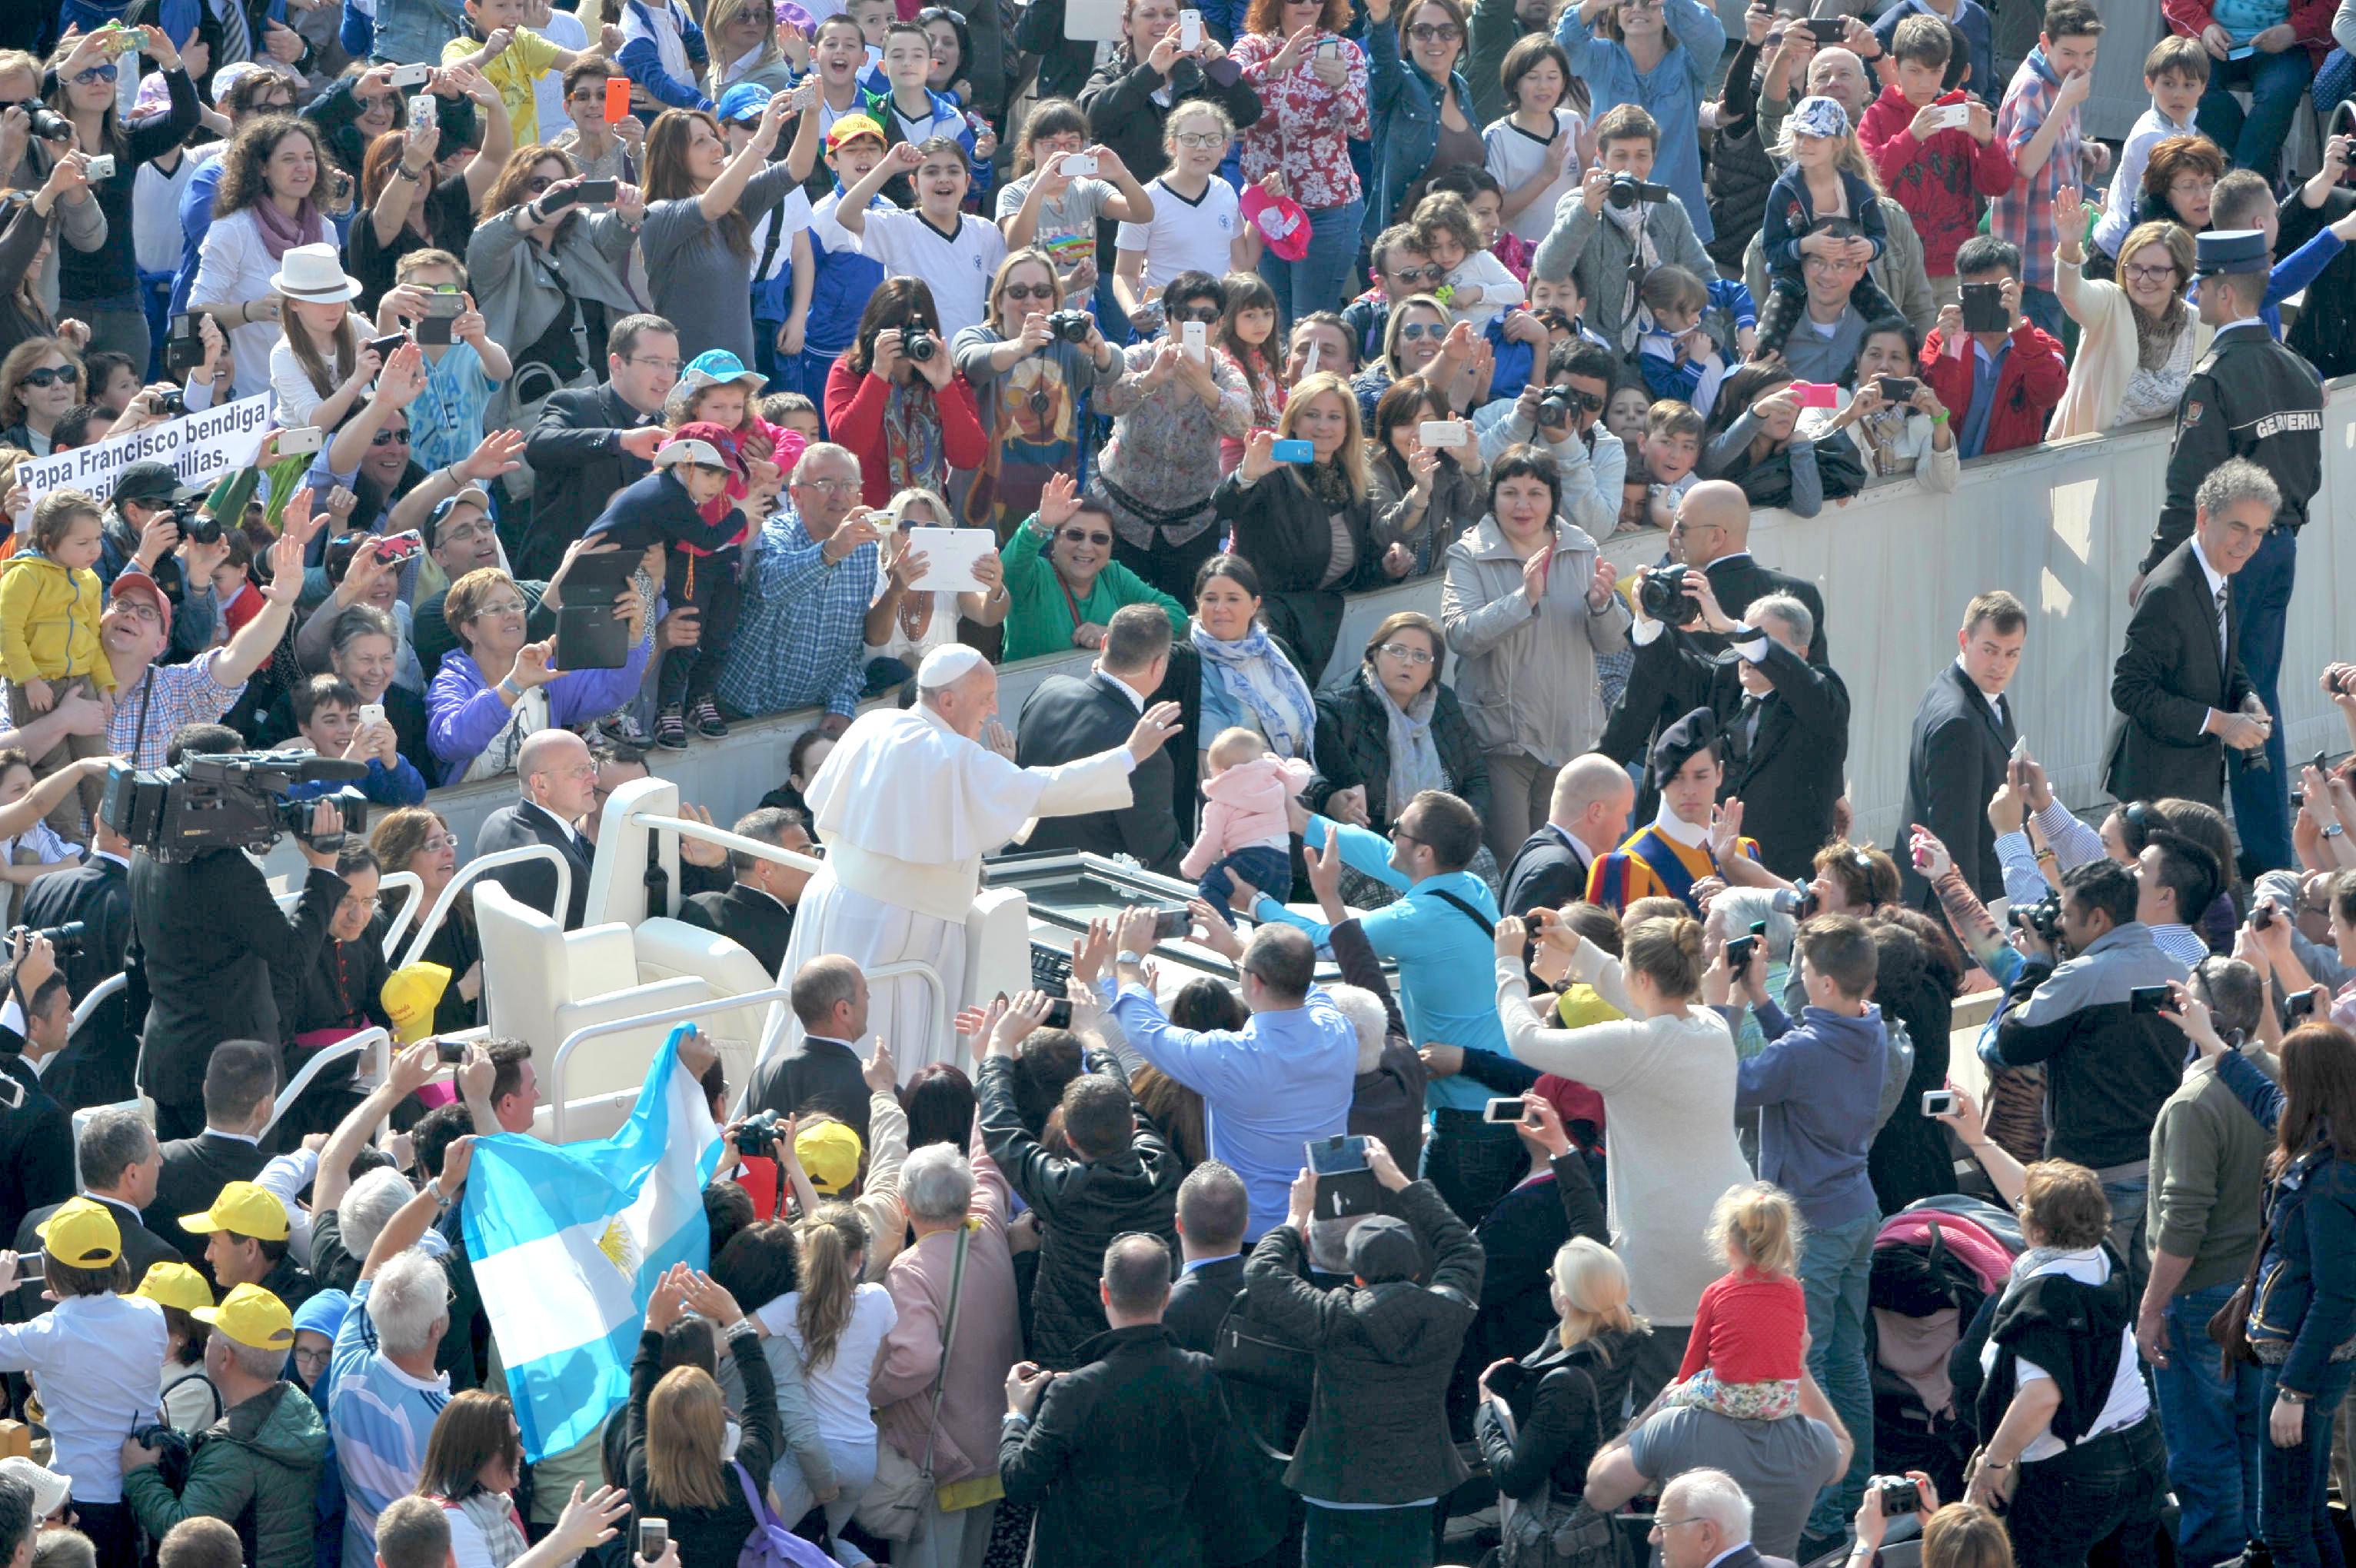 Pope Francis hearing April 14 2015